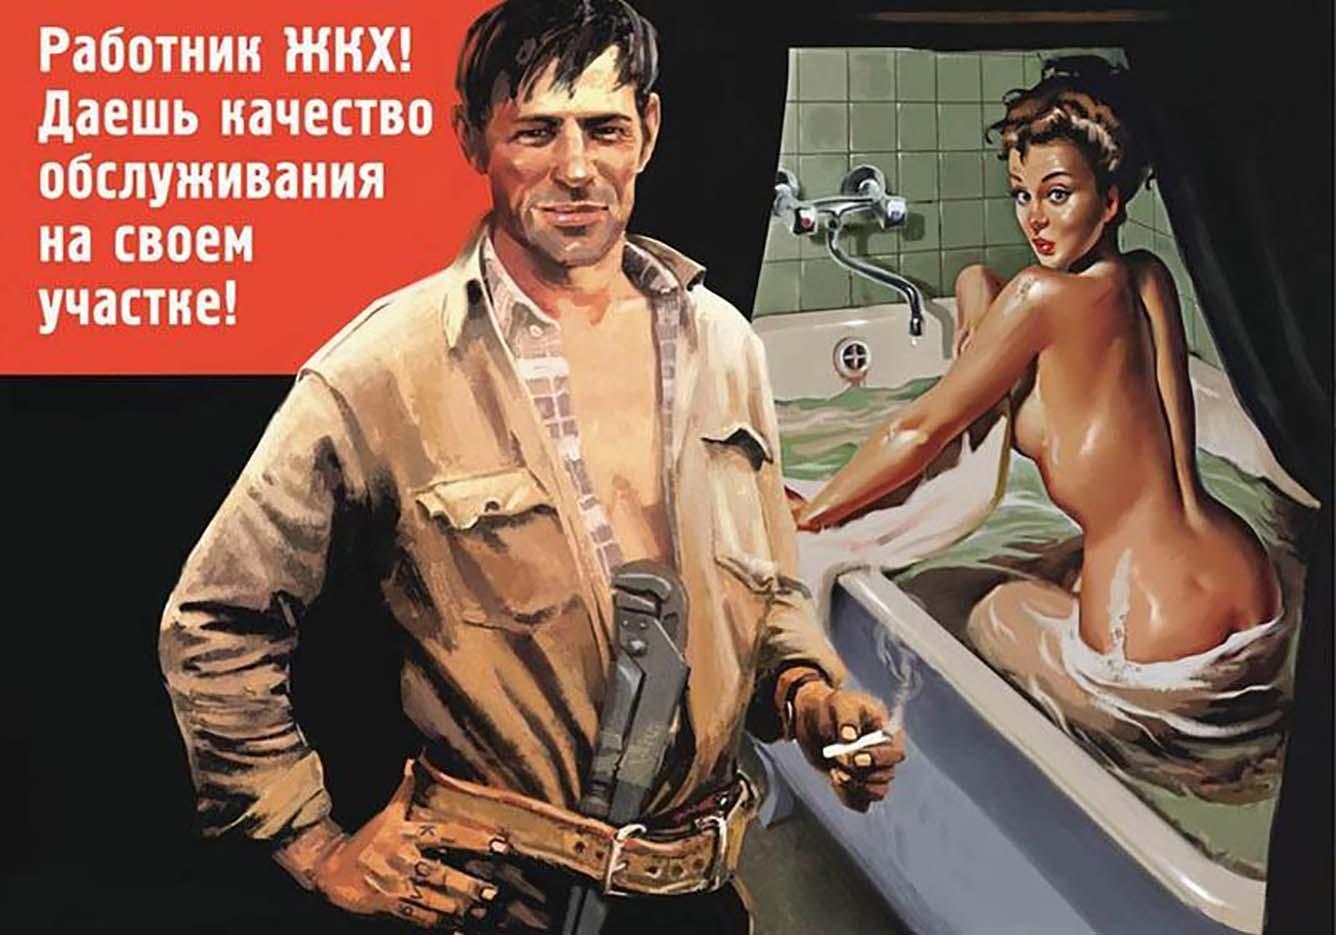 "Валерий Барыкин (Valery Barykin) ""Даешь качество обслуживания на своем участке | Give quality service on your site"""